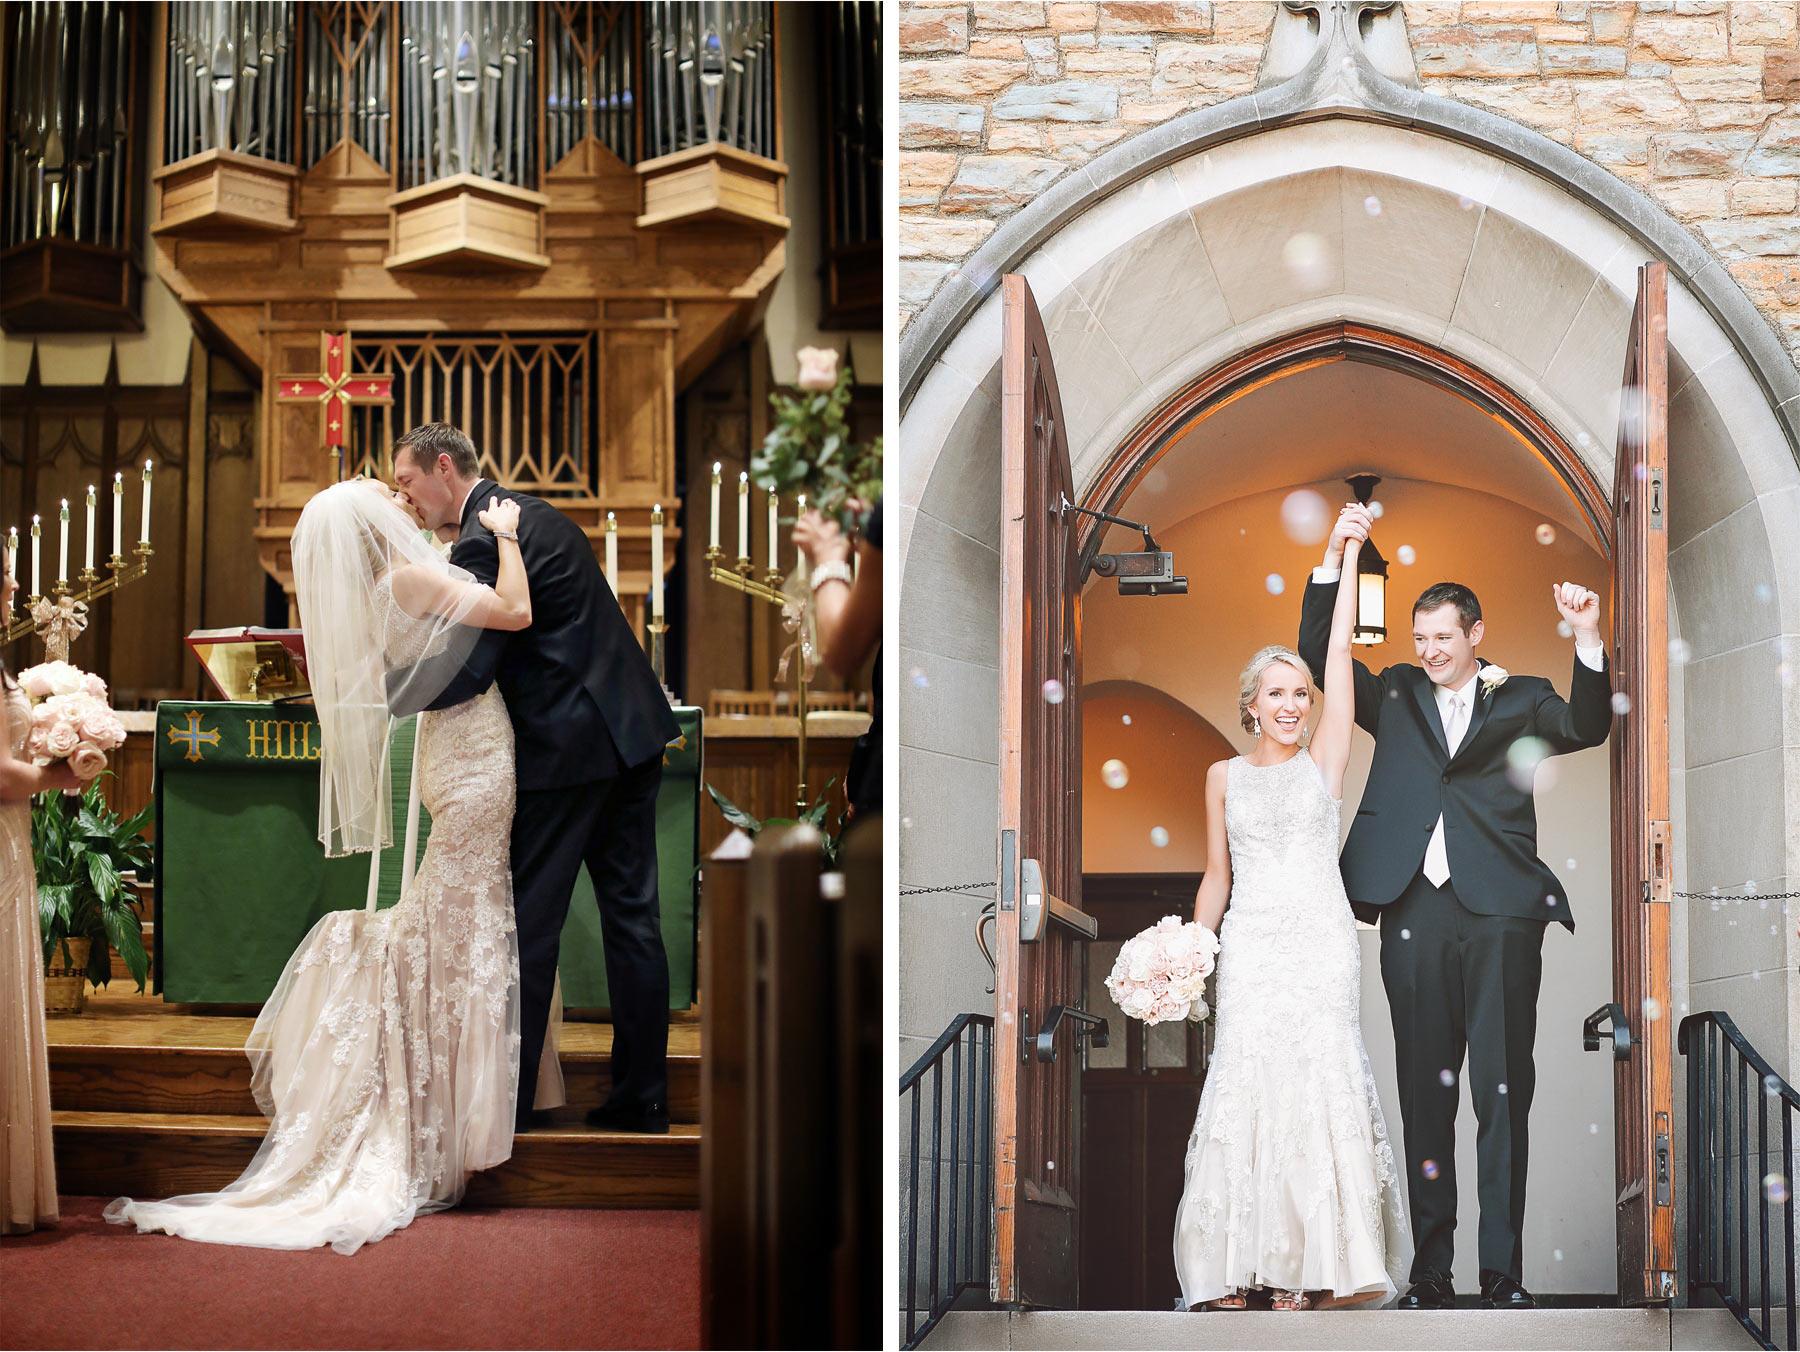 10-Minneapolis-Minnesota-Wedding-Photography-by-Vick-Photography-Ceremony-Lake-of-the-Isles-Lutheran-Church-Jenna-and-Josh.jpg